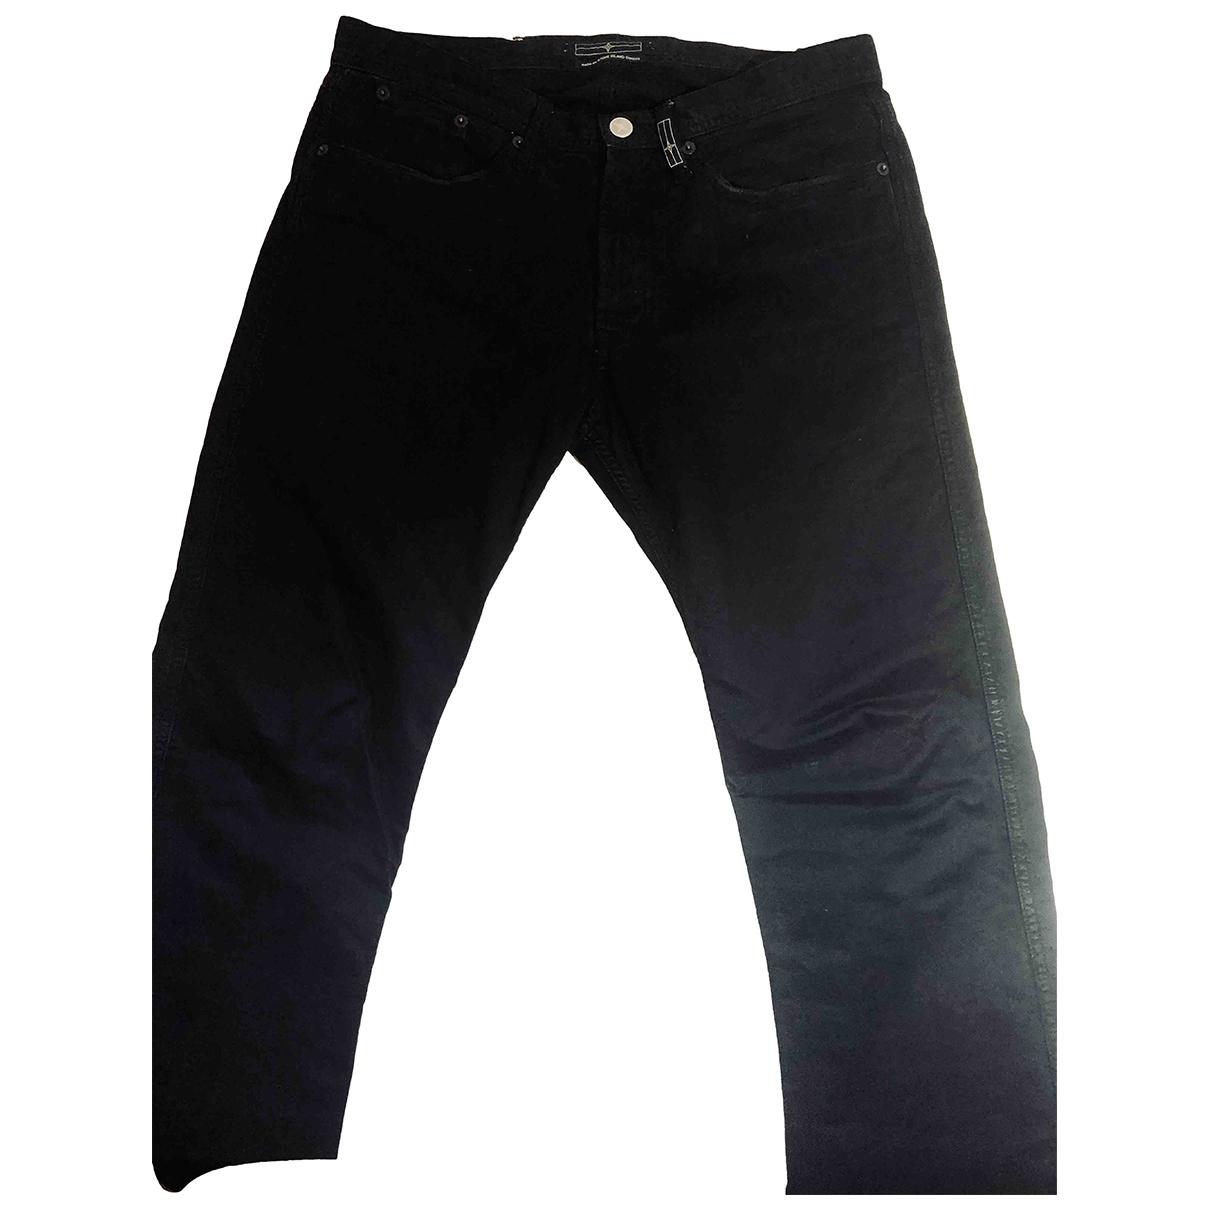 Stone Island \N Black Cotton Jeans for Men 30 UK - US